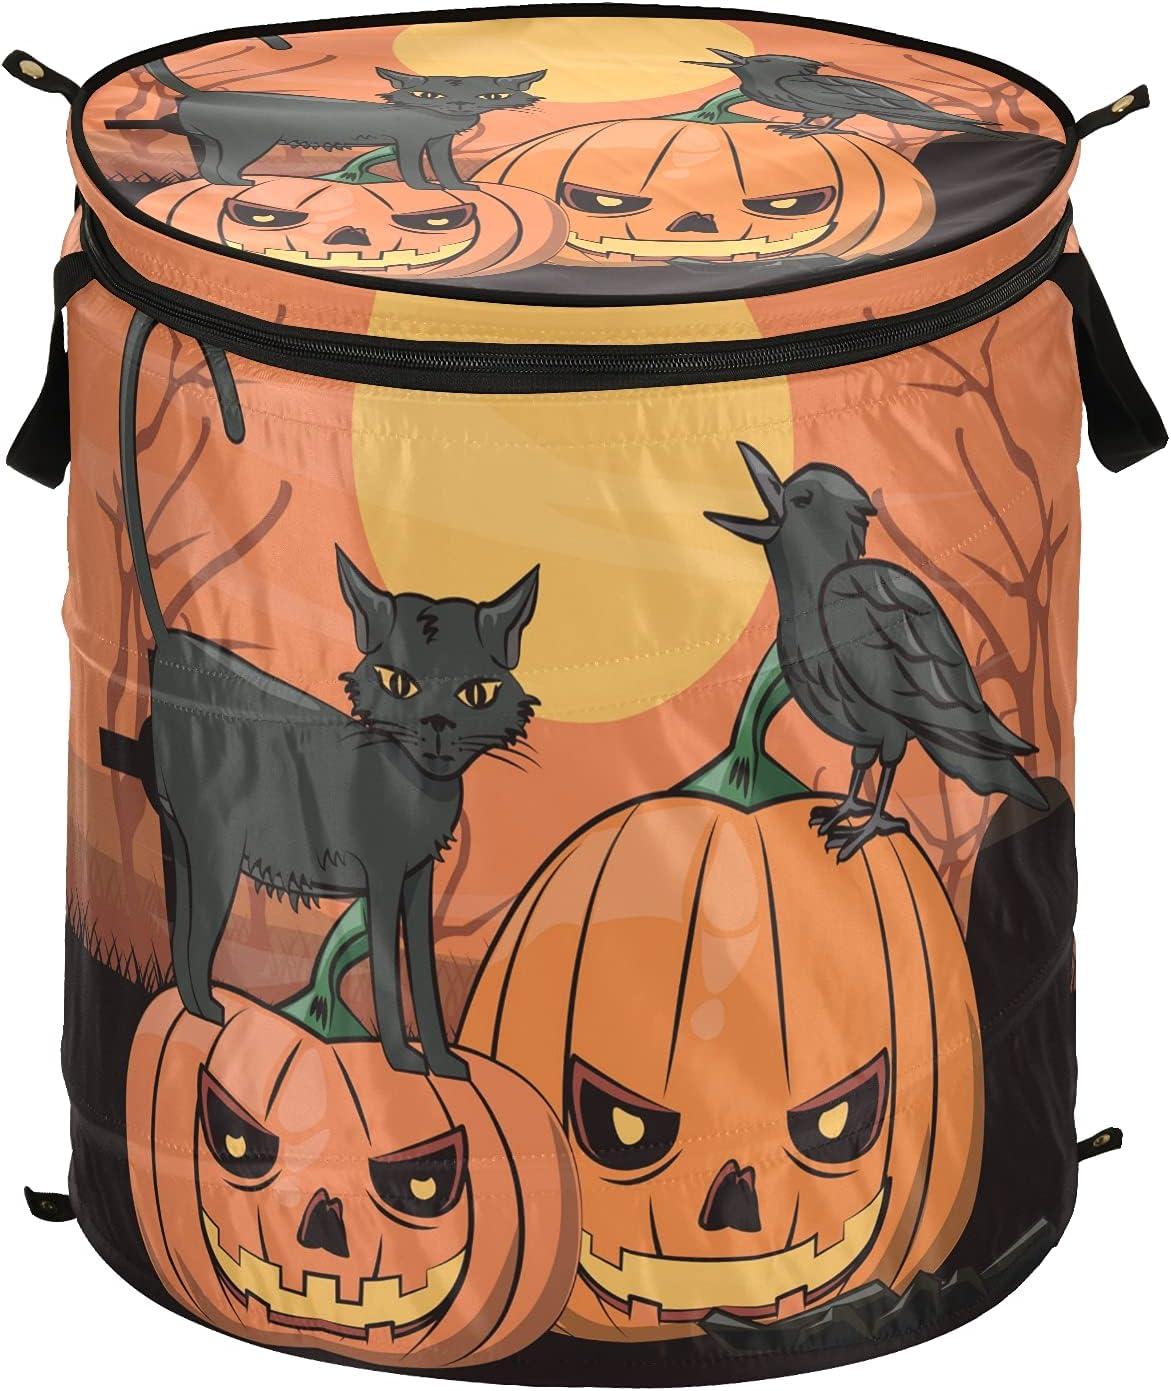 Halloween Black Mail order Cat Branded goods Jack Lantern Pumpkin Up Pop Laundry Hamper w